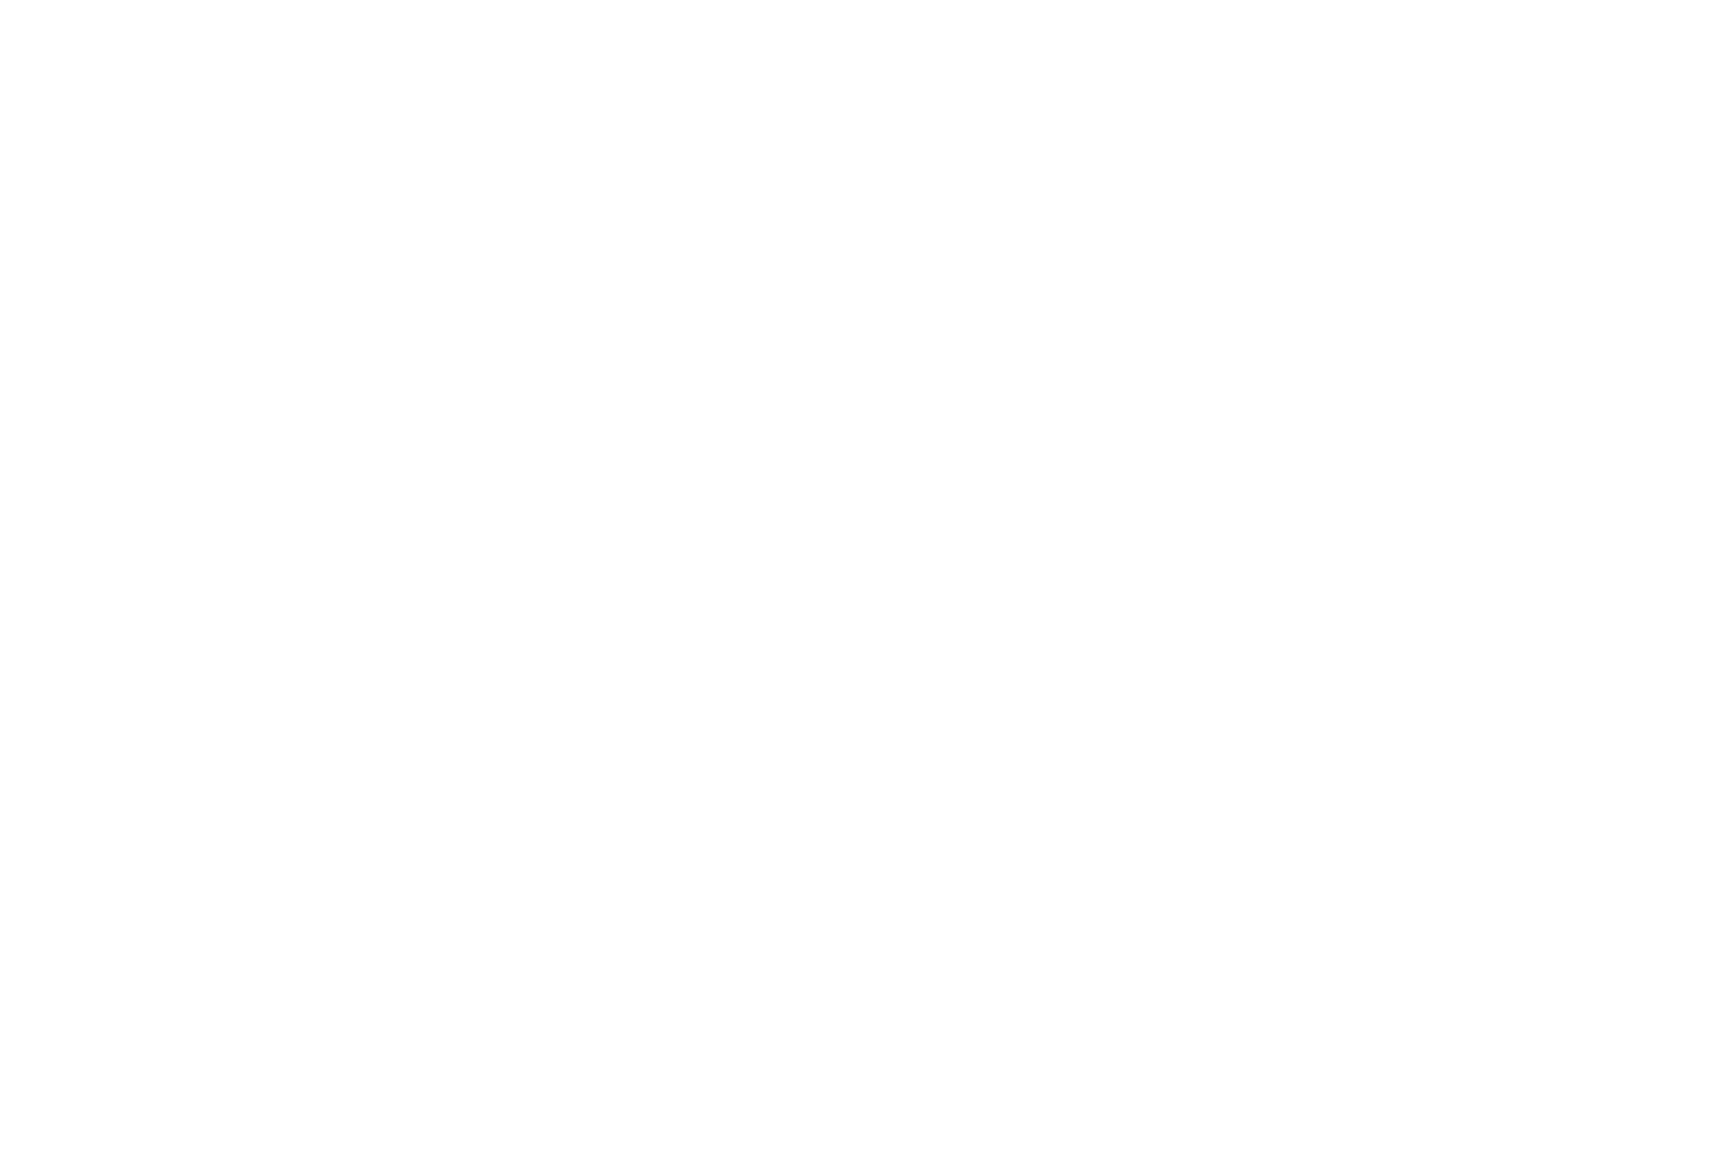 SELECCON OFICIAL - Lima Independiente In